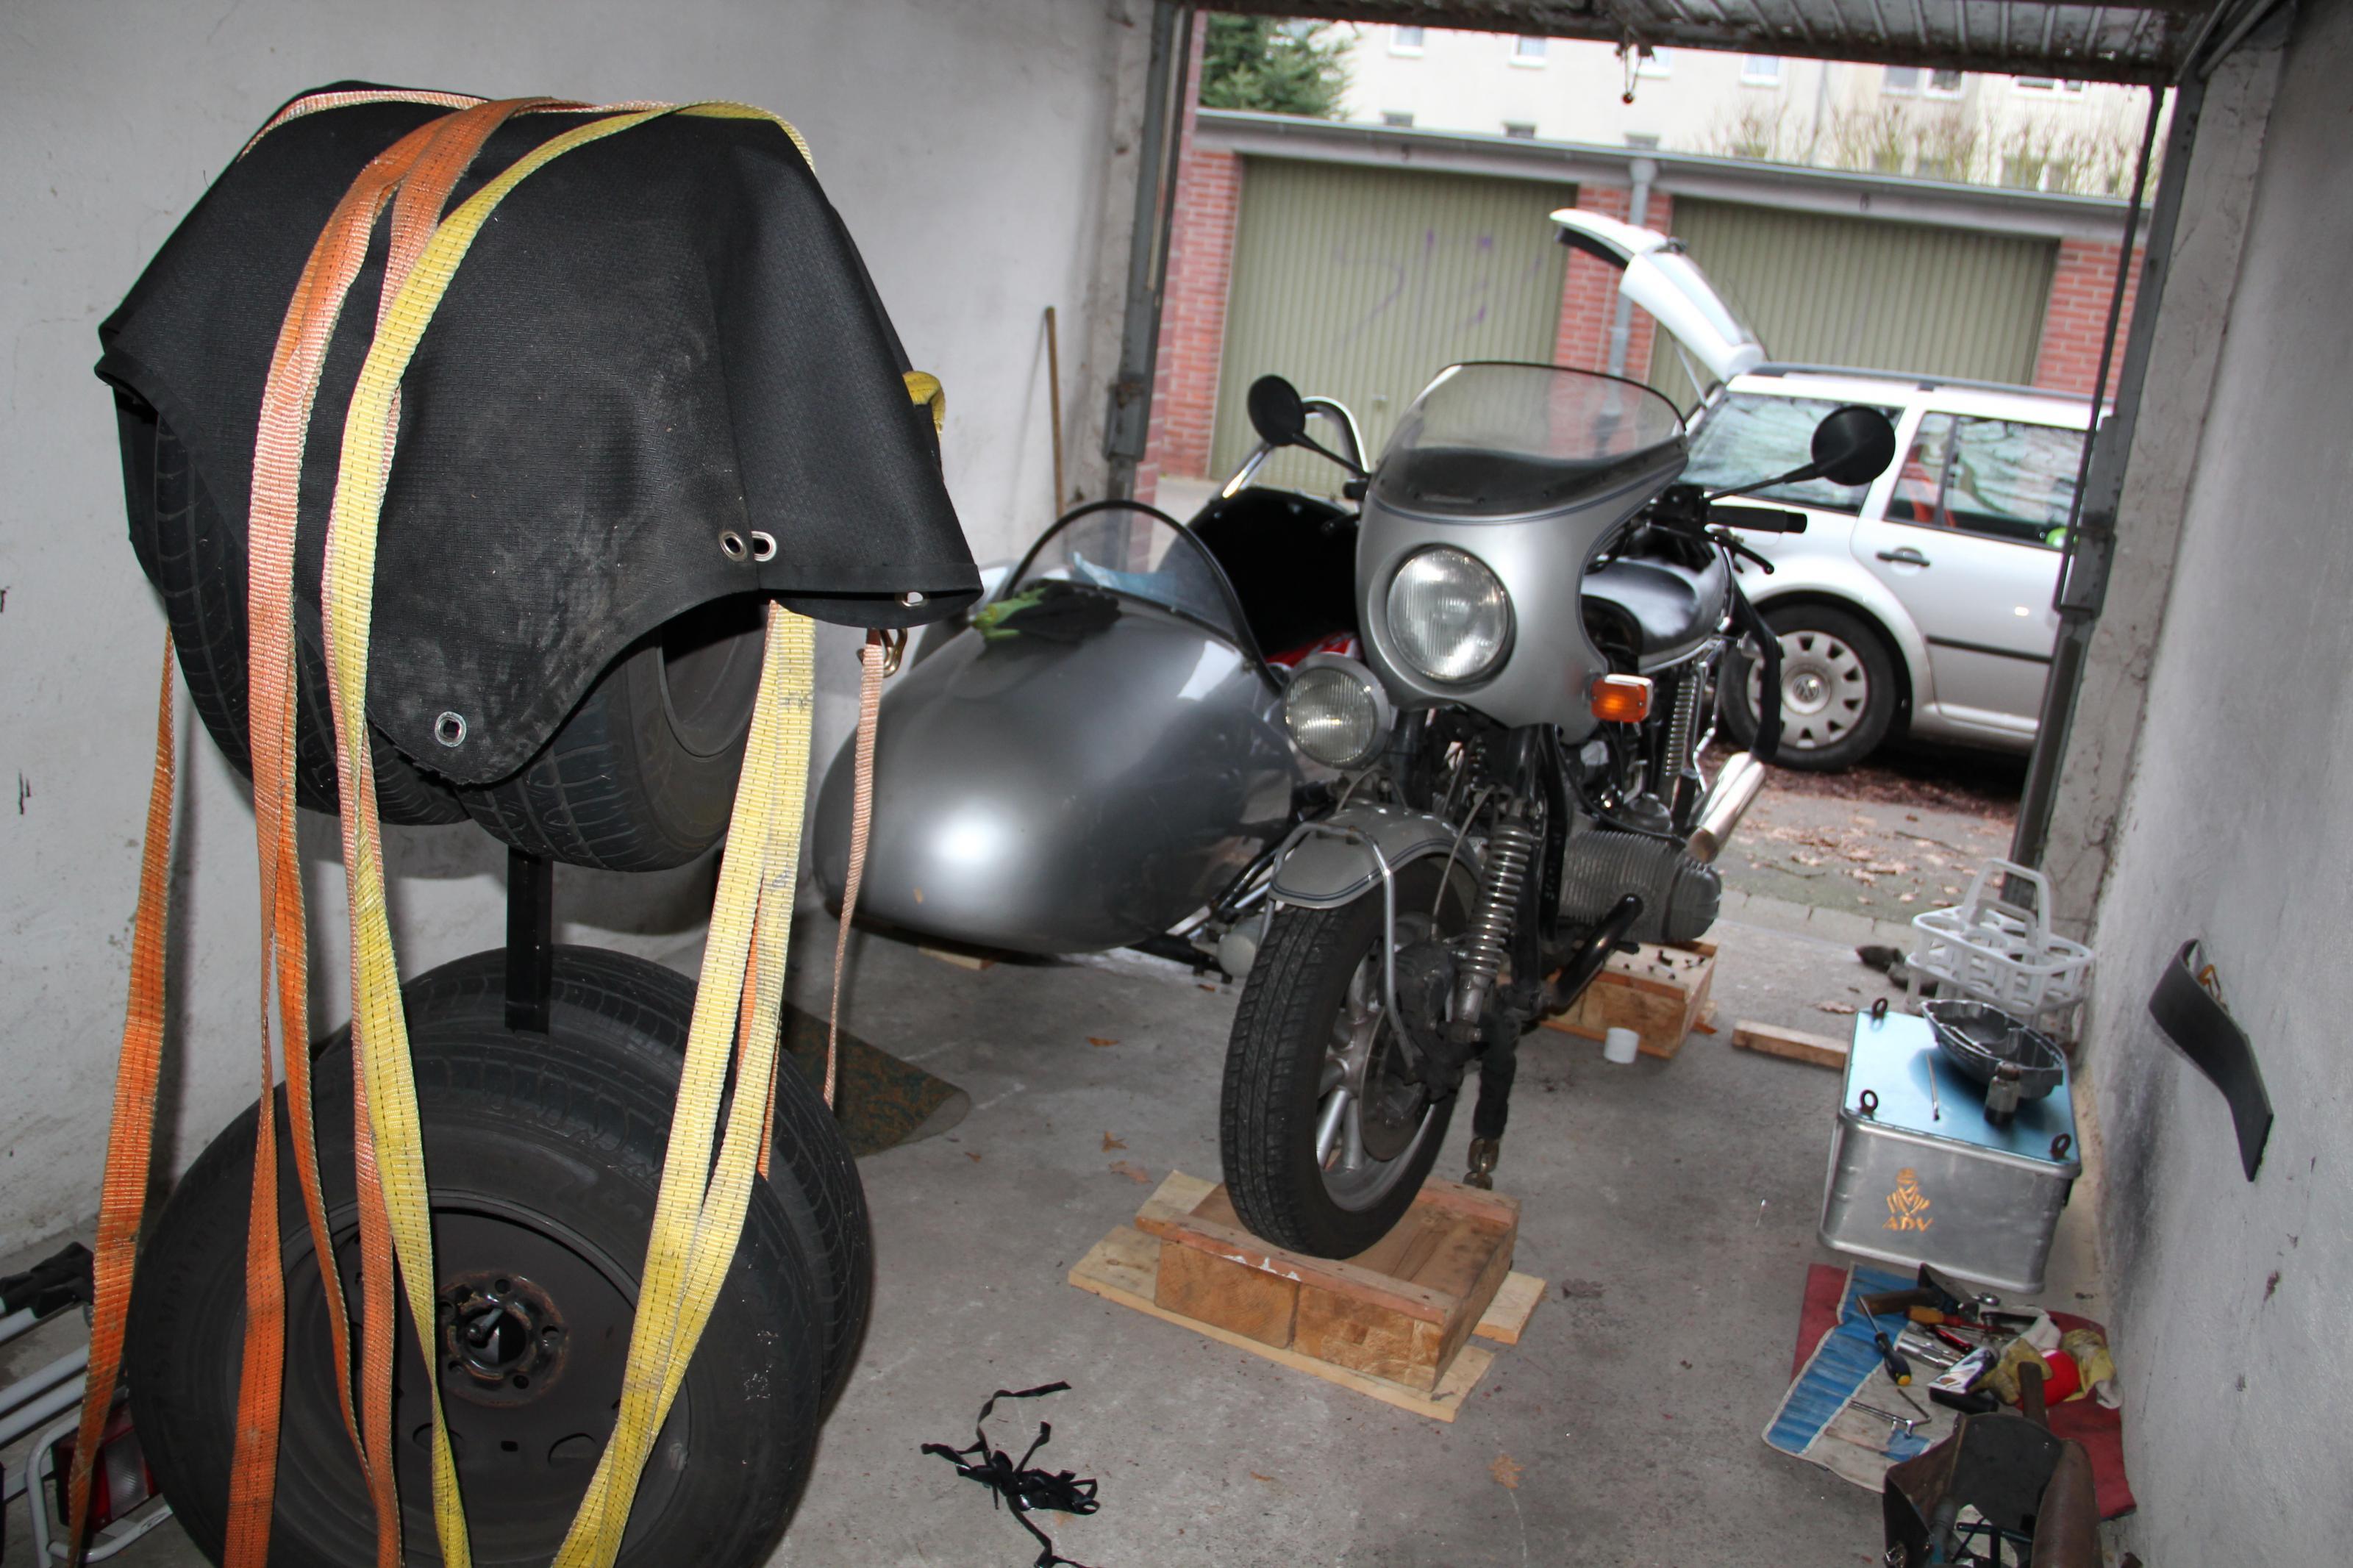 15-01-19_0003_garage_r100_gespann.jpg